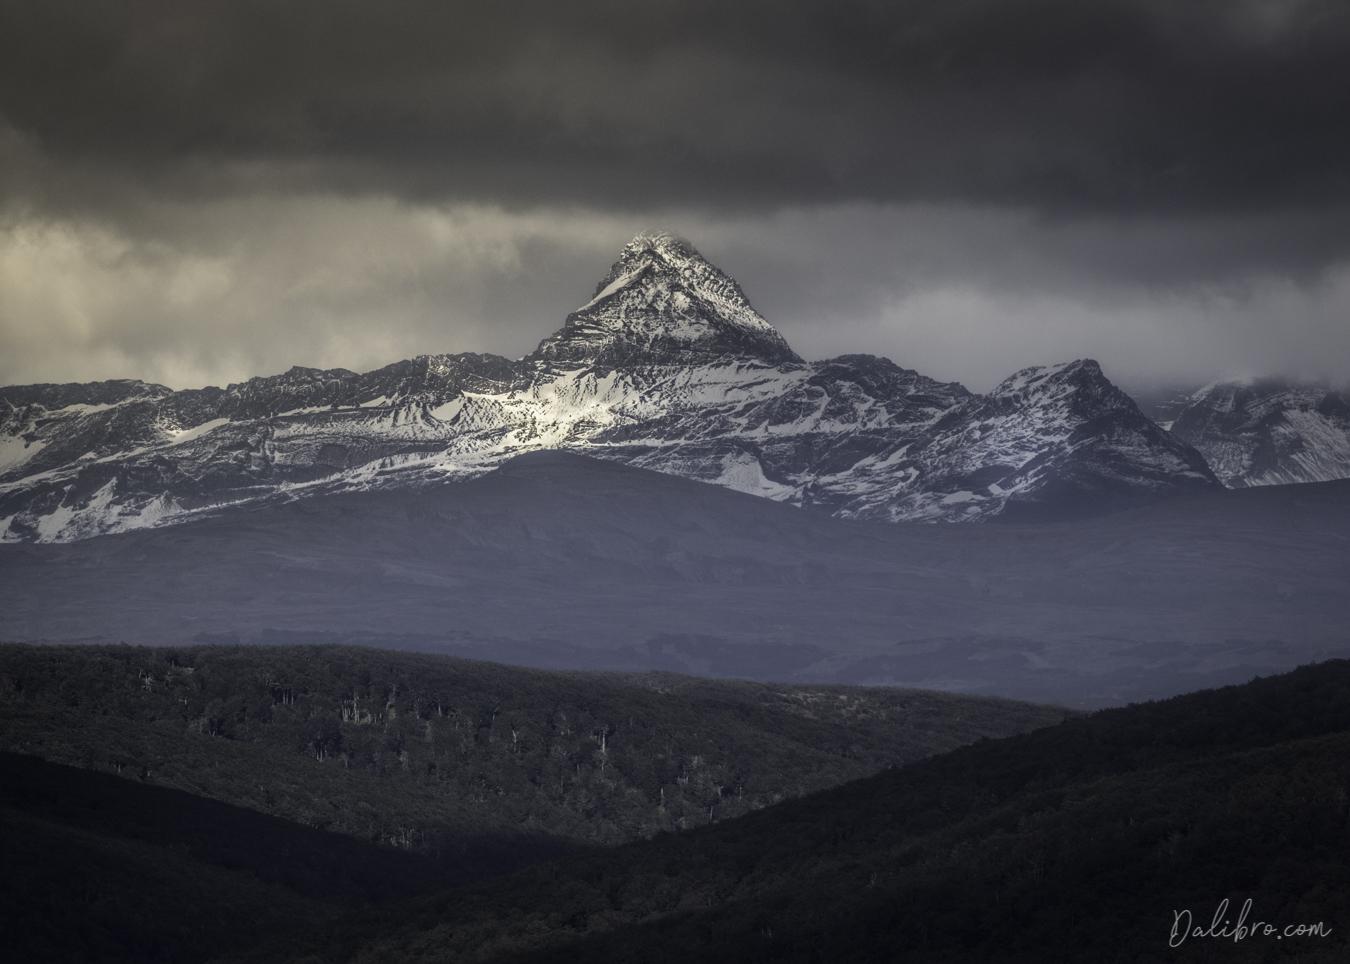 Cordillera Darwin at the end of the world, Tierra del Fuego. Somewhere behind it, Antarctica